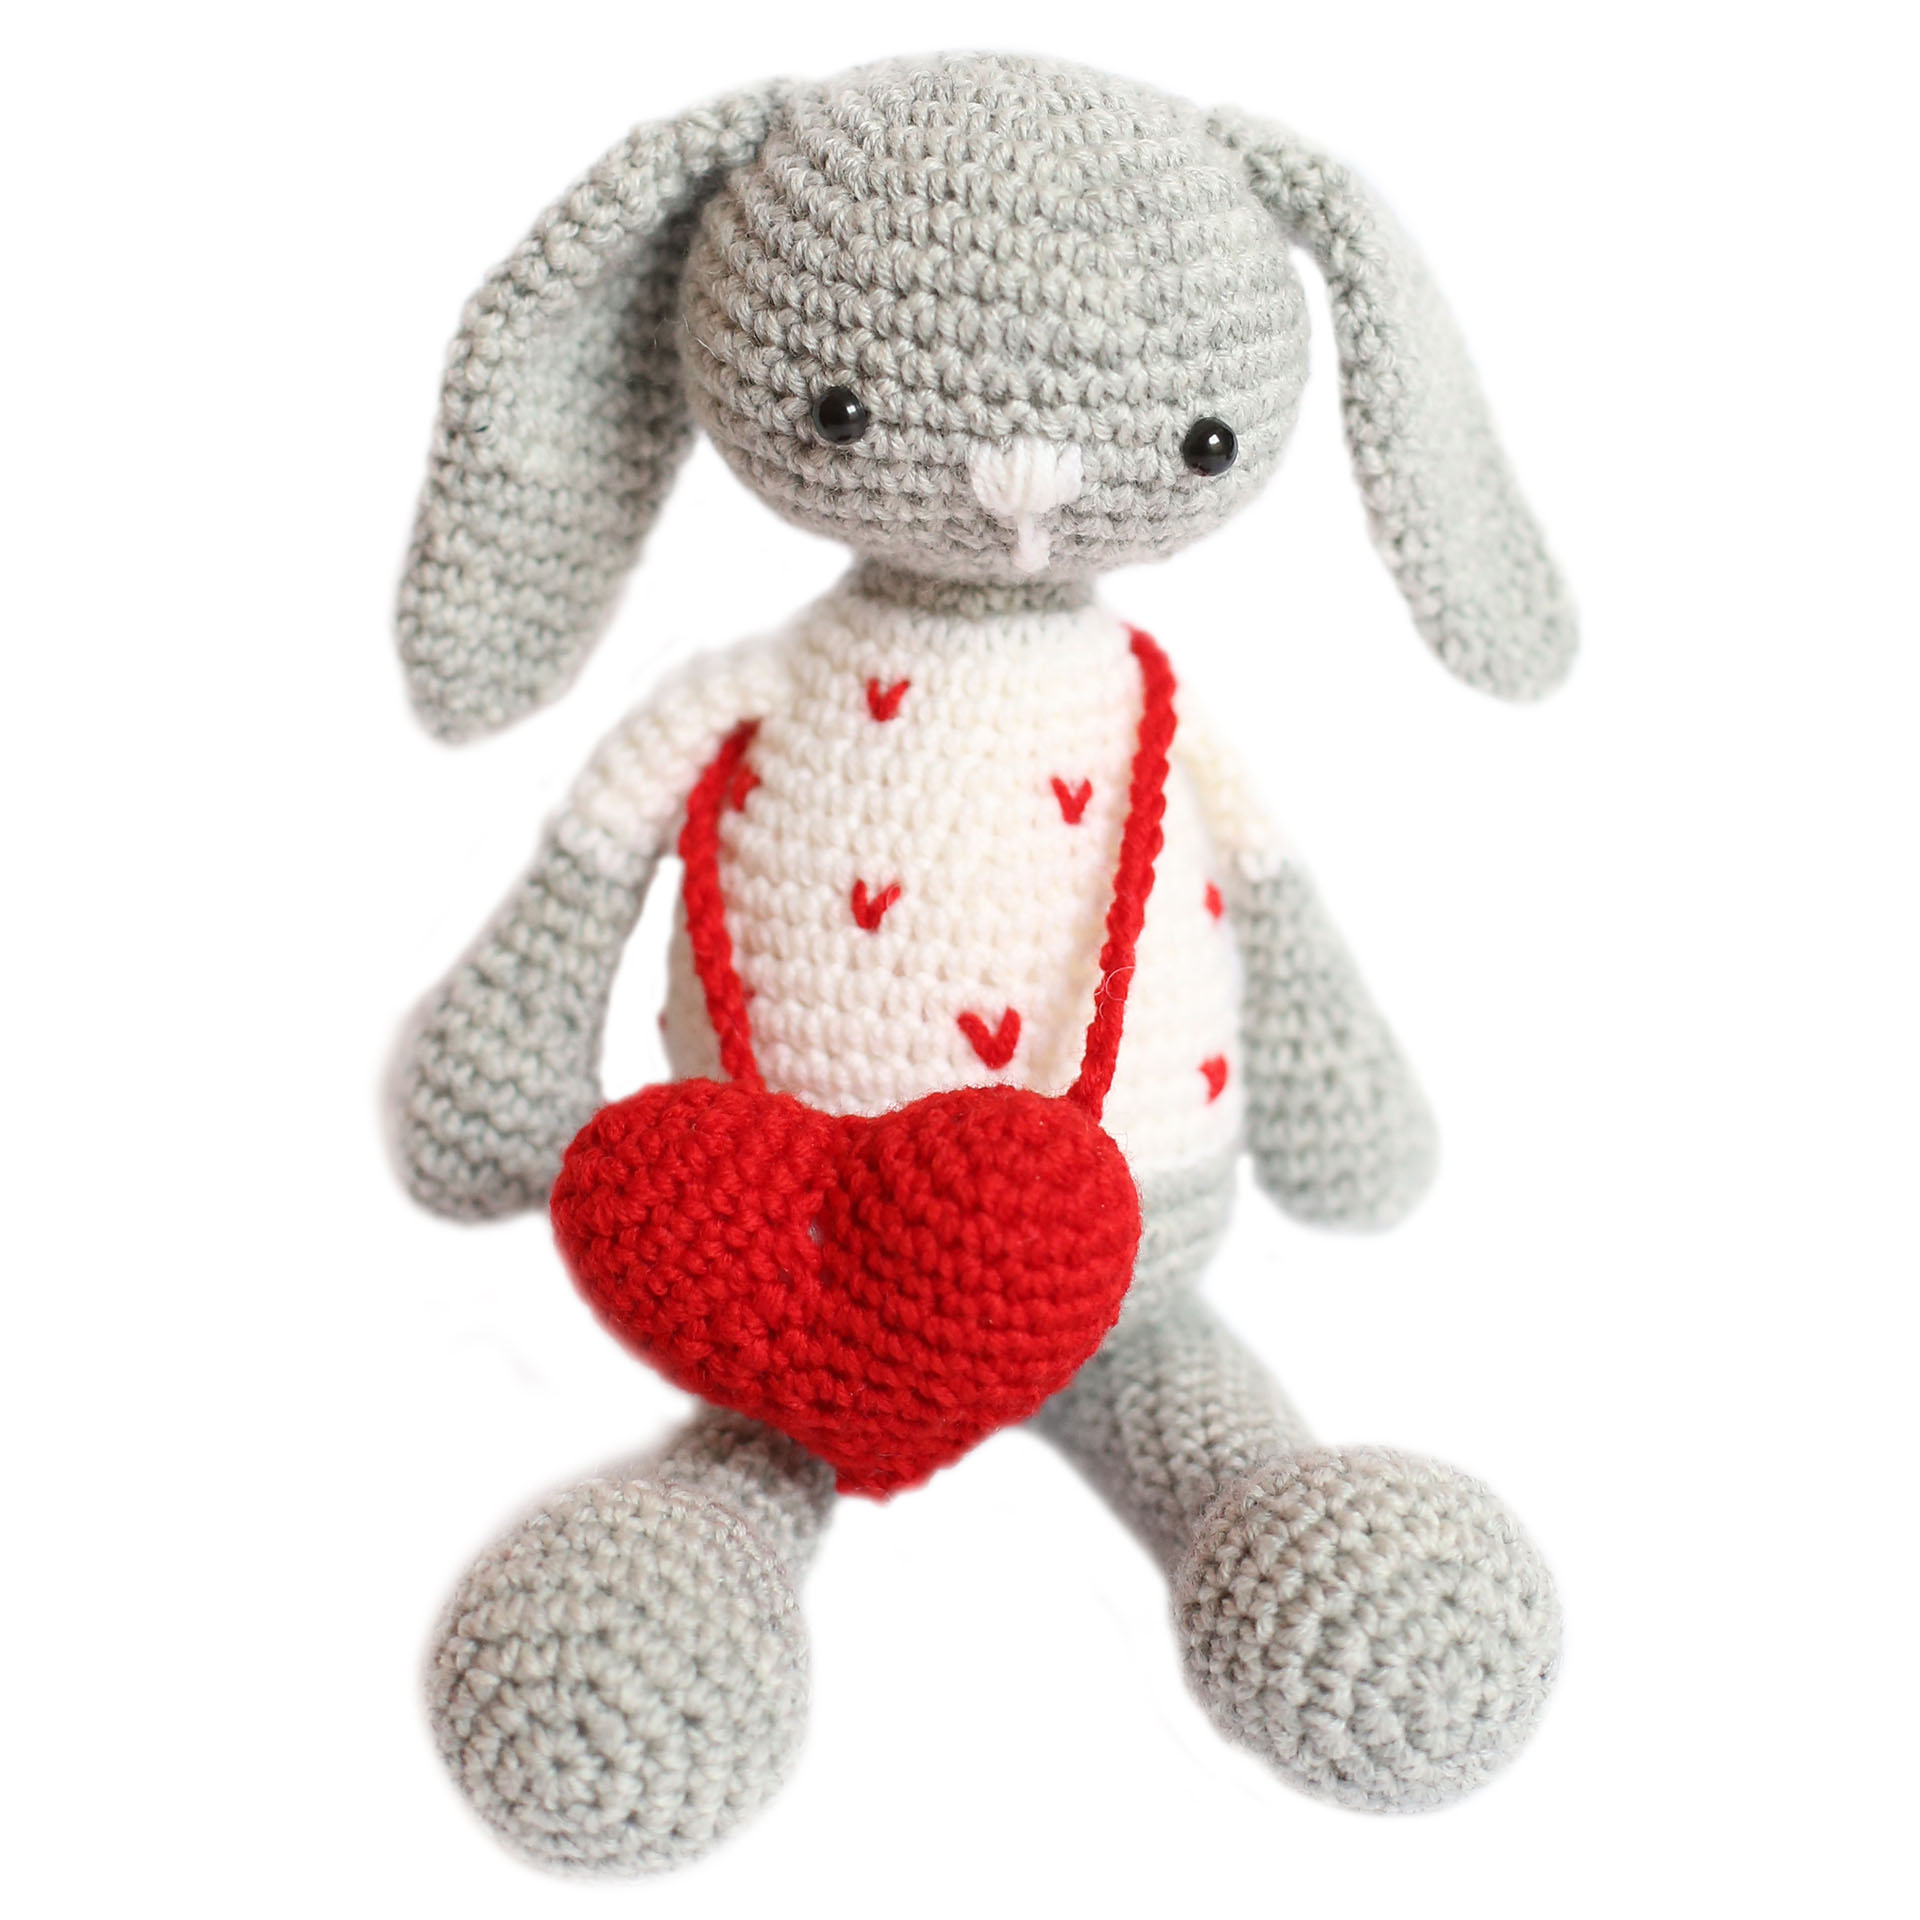 amigurumi-crochet-uncinetto-pattern-hook-mondo-waooo-happy-shop-hook-coniglietto-coniglio-cuore-heart-rabbit-spring-easter-toys-children-plush-puppet-handmade